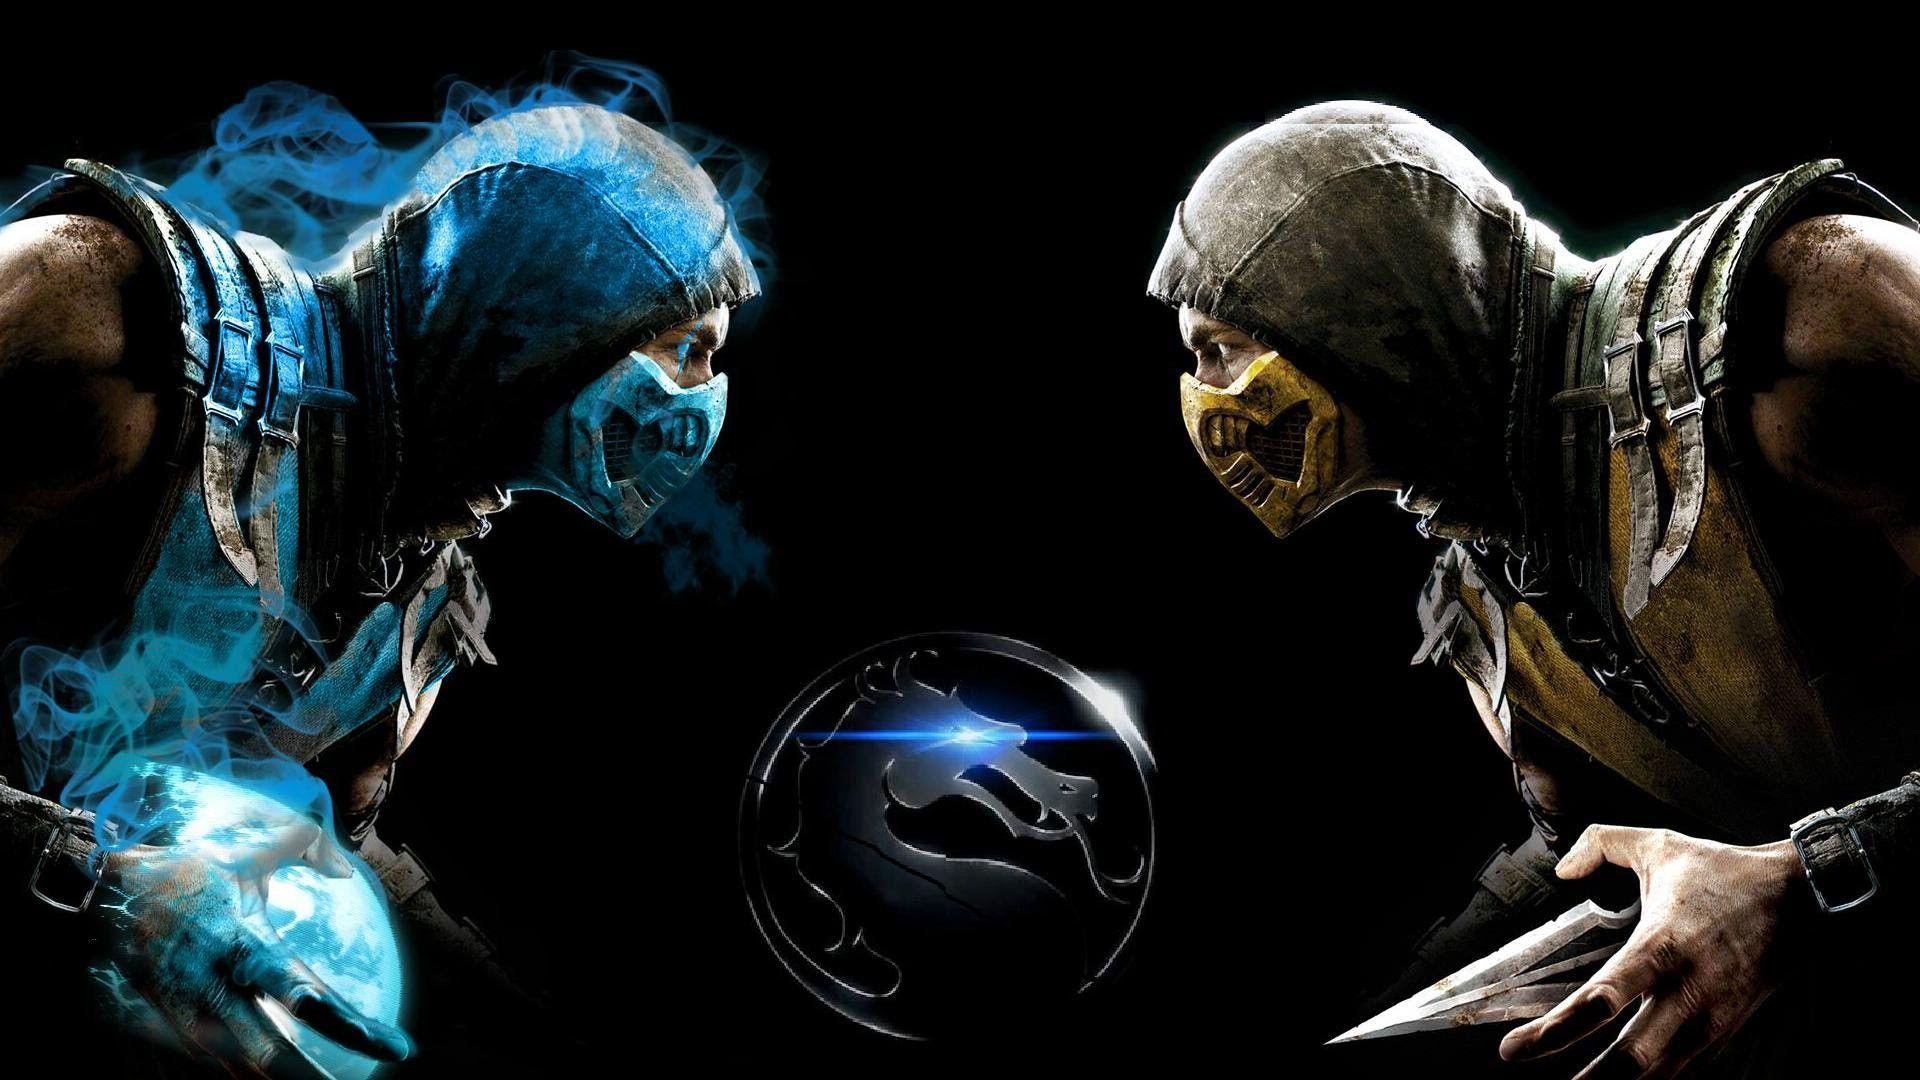 Sub Zero Vs Scorpion Mortal Kombat X Scorpion Mortal Kombat X Mortal Kombat Art Sub zero vs scorpion mortal kombat